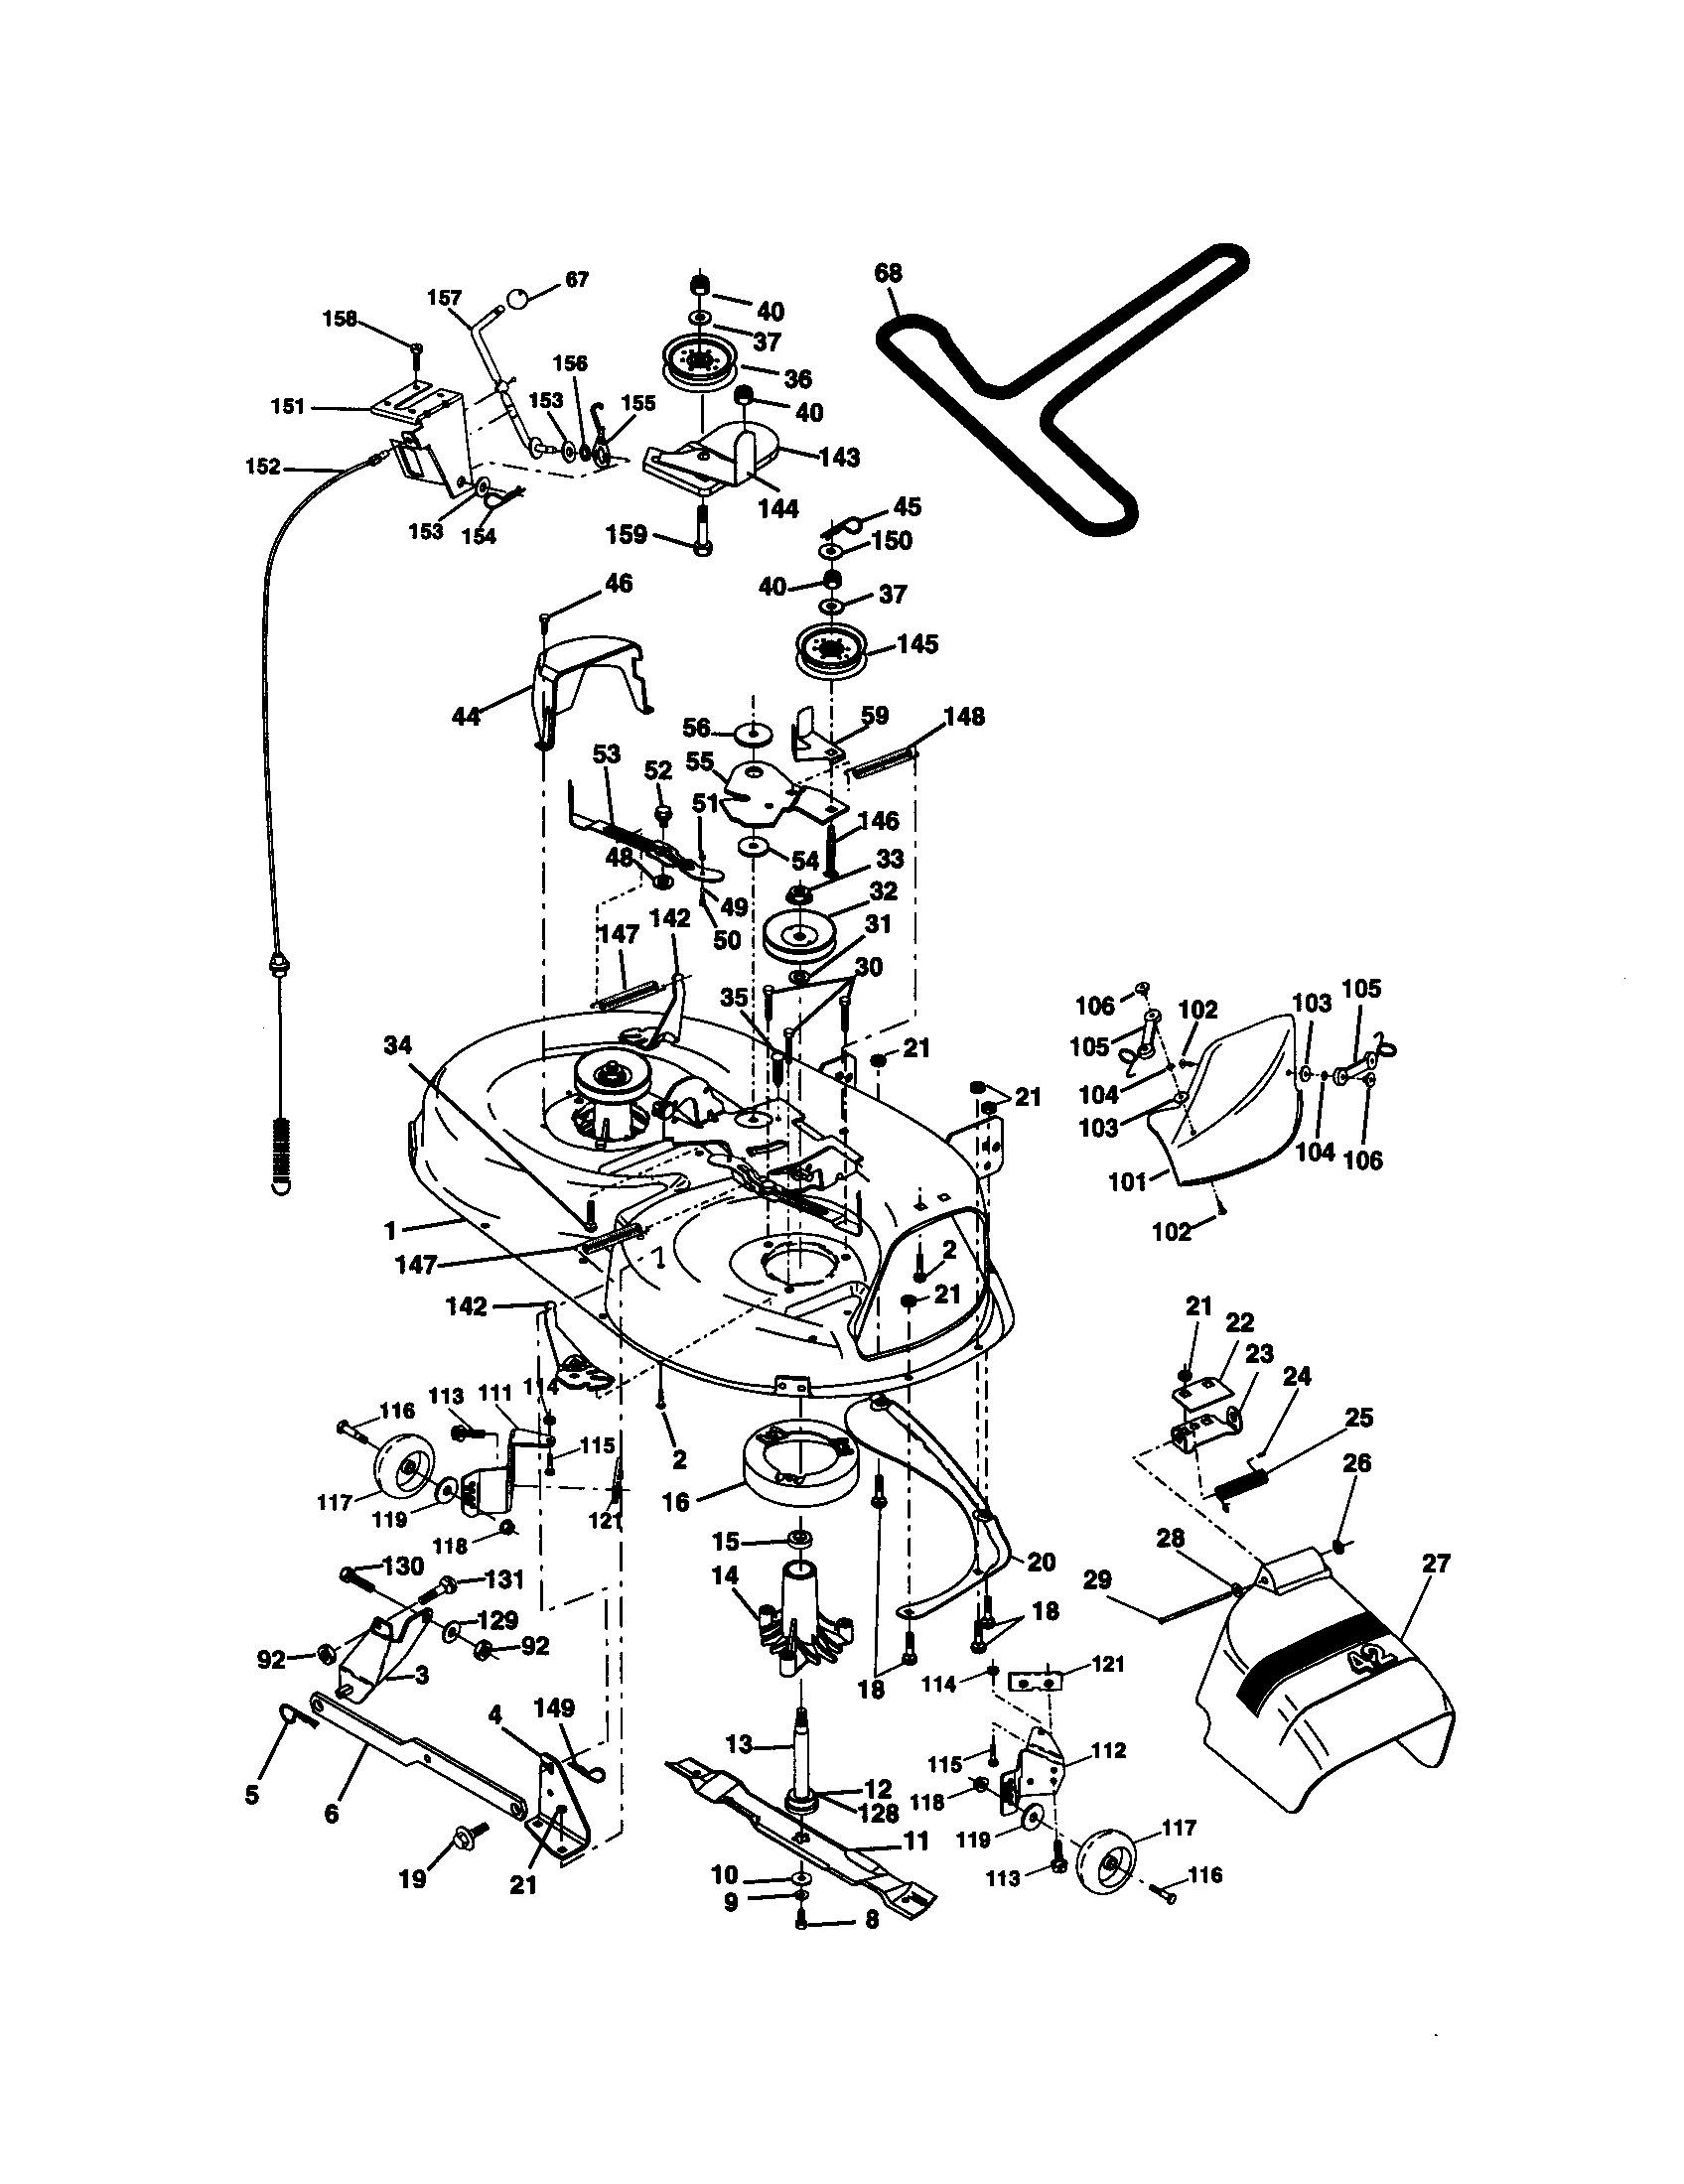 Diagram Of Lawn Mower Engine Craftsman Model Lawn Tractor Genuine Parts Of Diagram Of Lawn Mower Engine